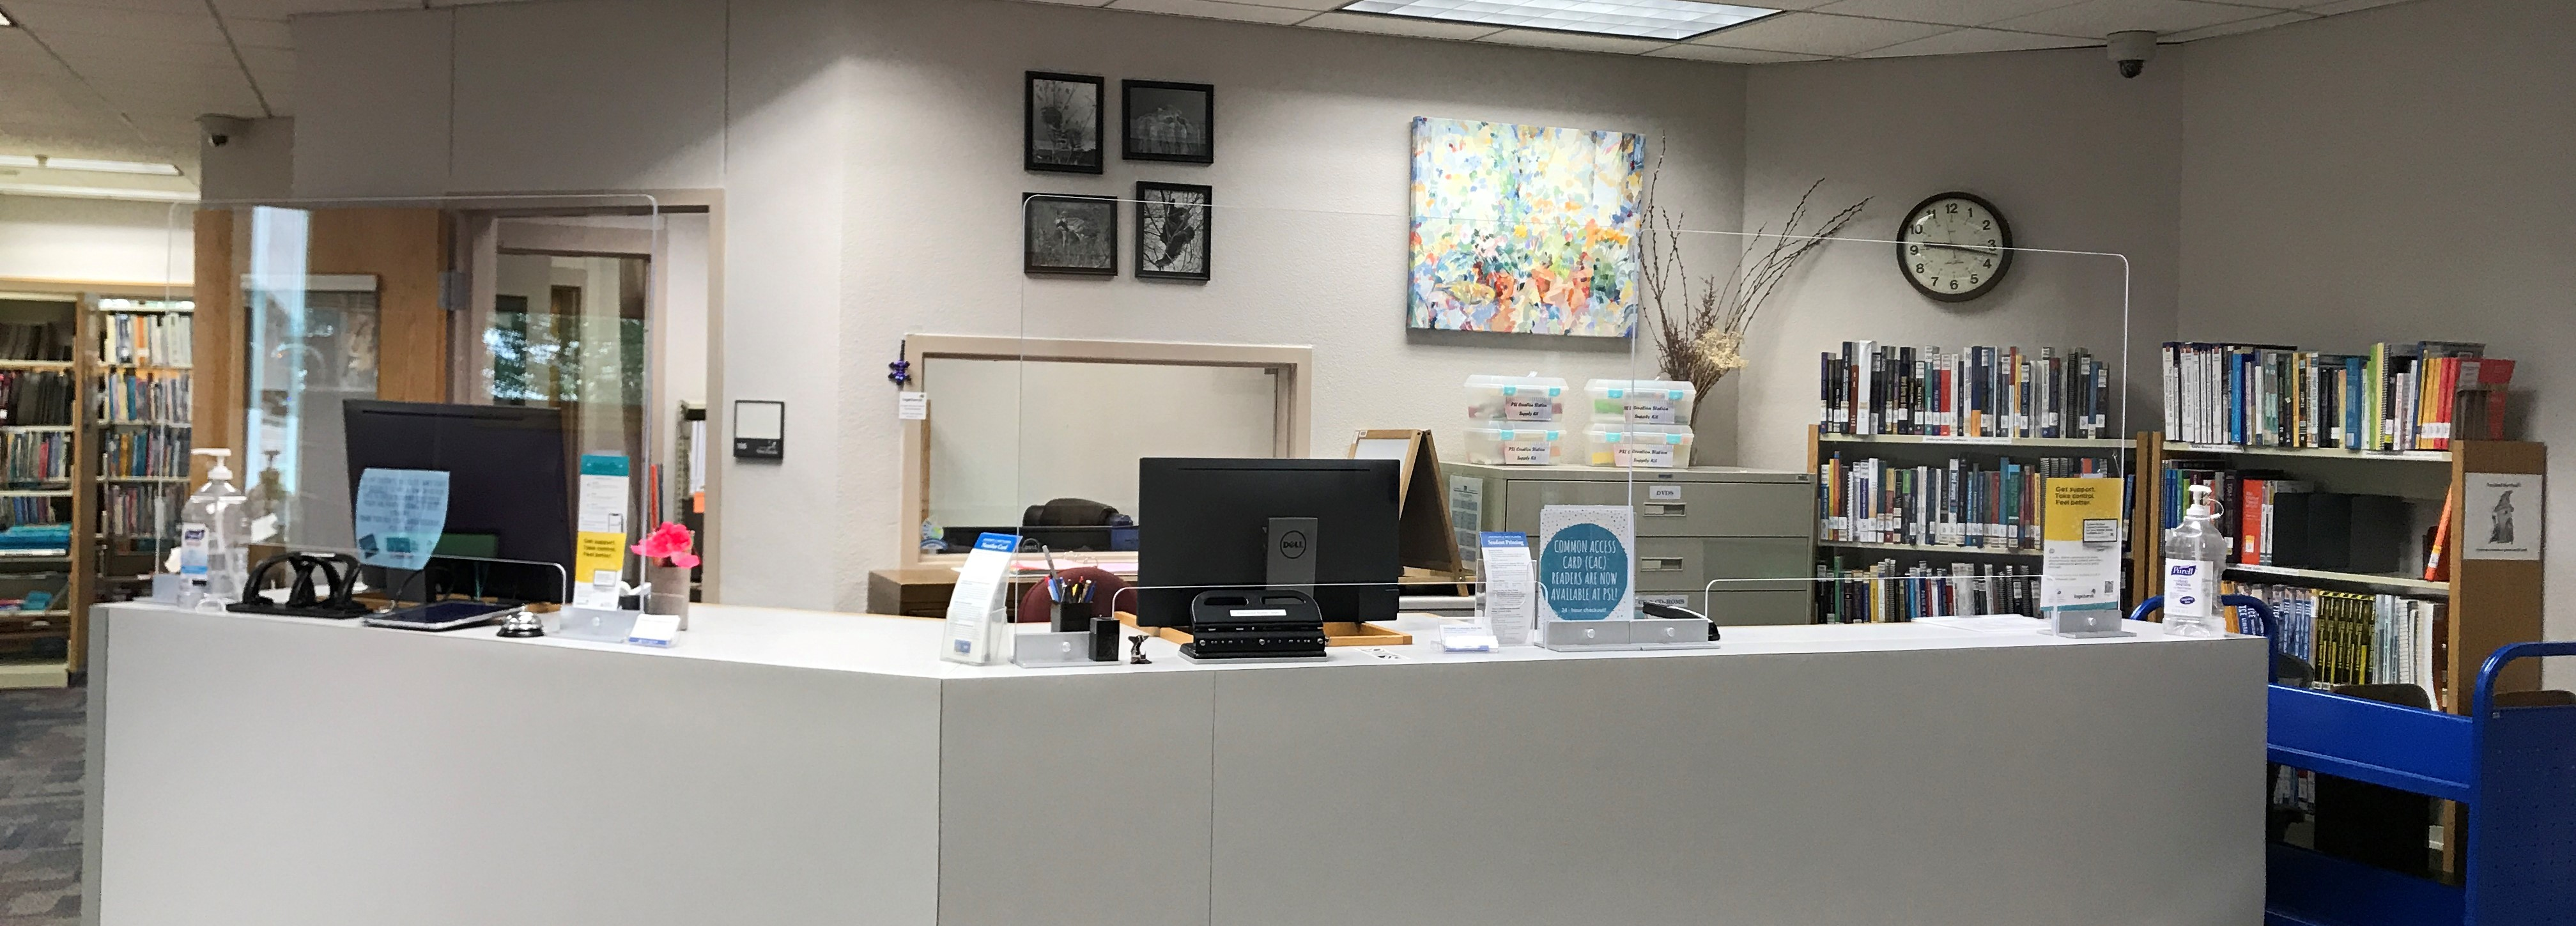 Professional Studies Library Service Desk